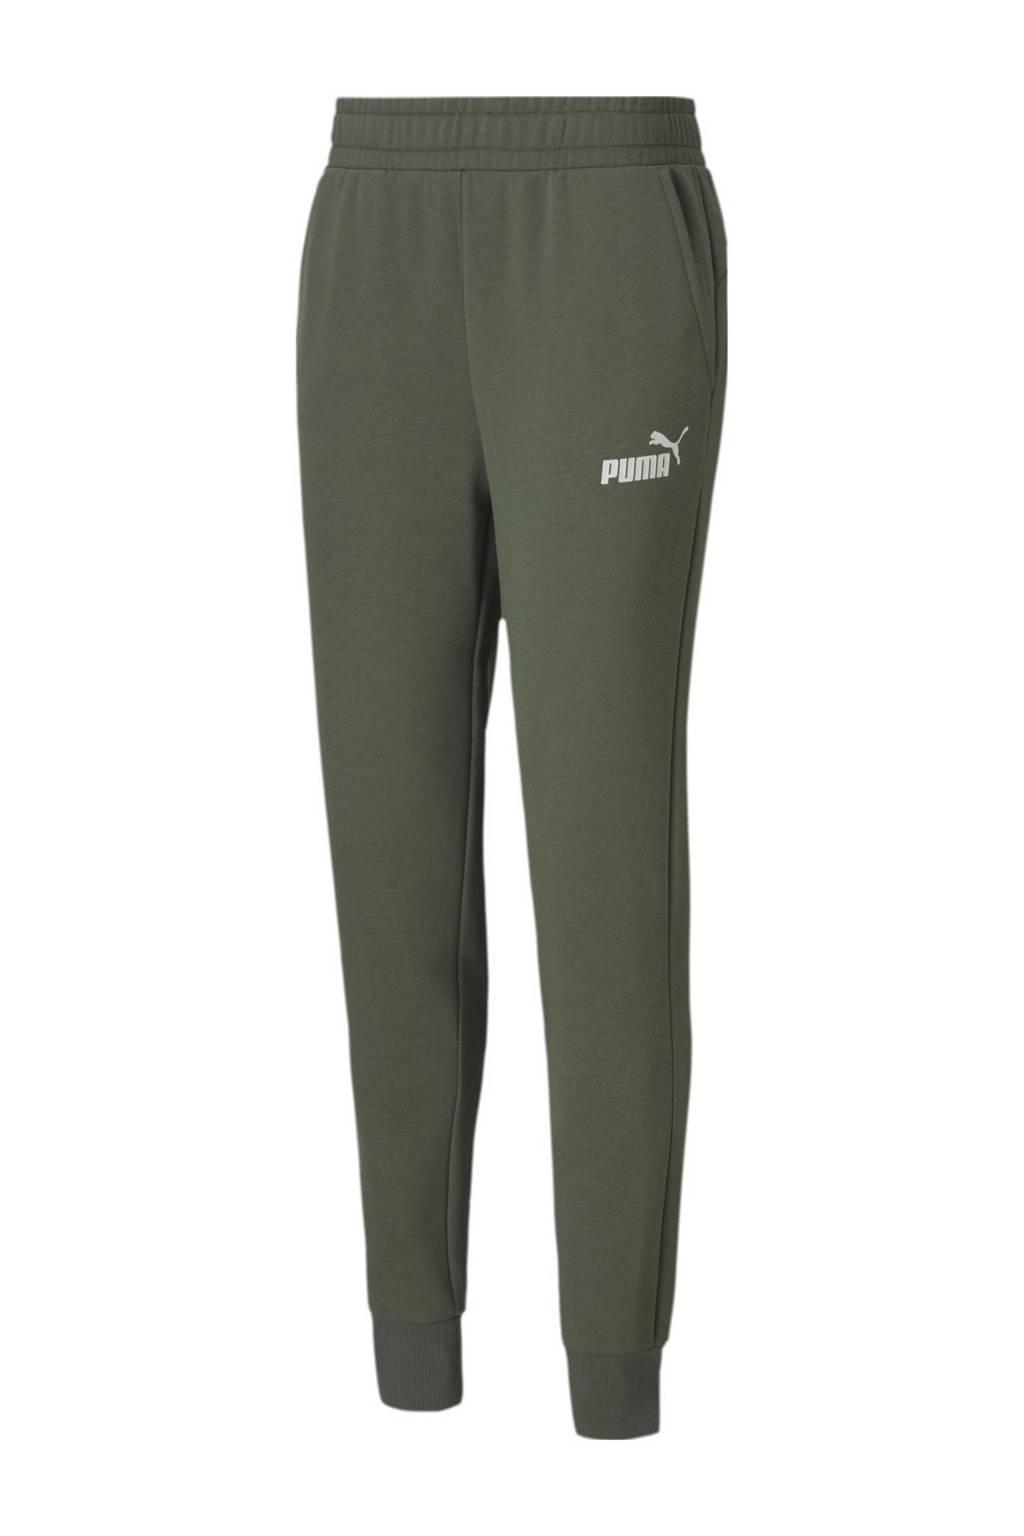 Puma No.1 Logo joggingbroek kaki, Kaki